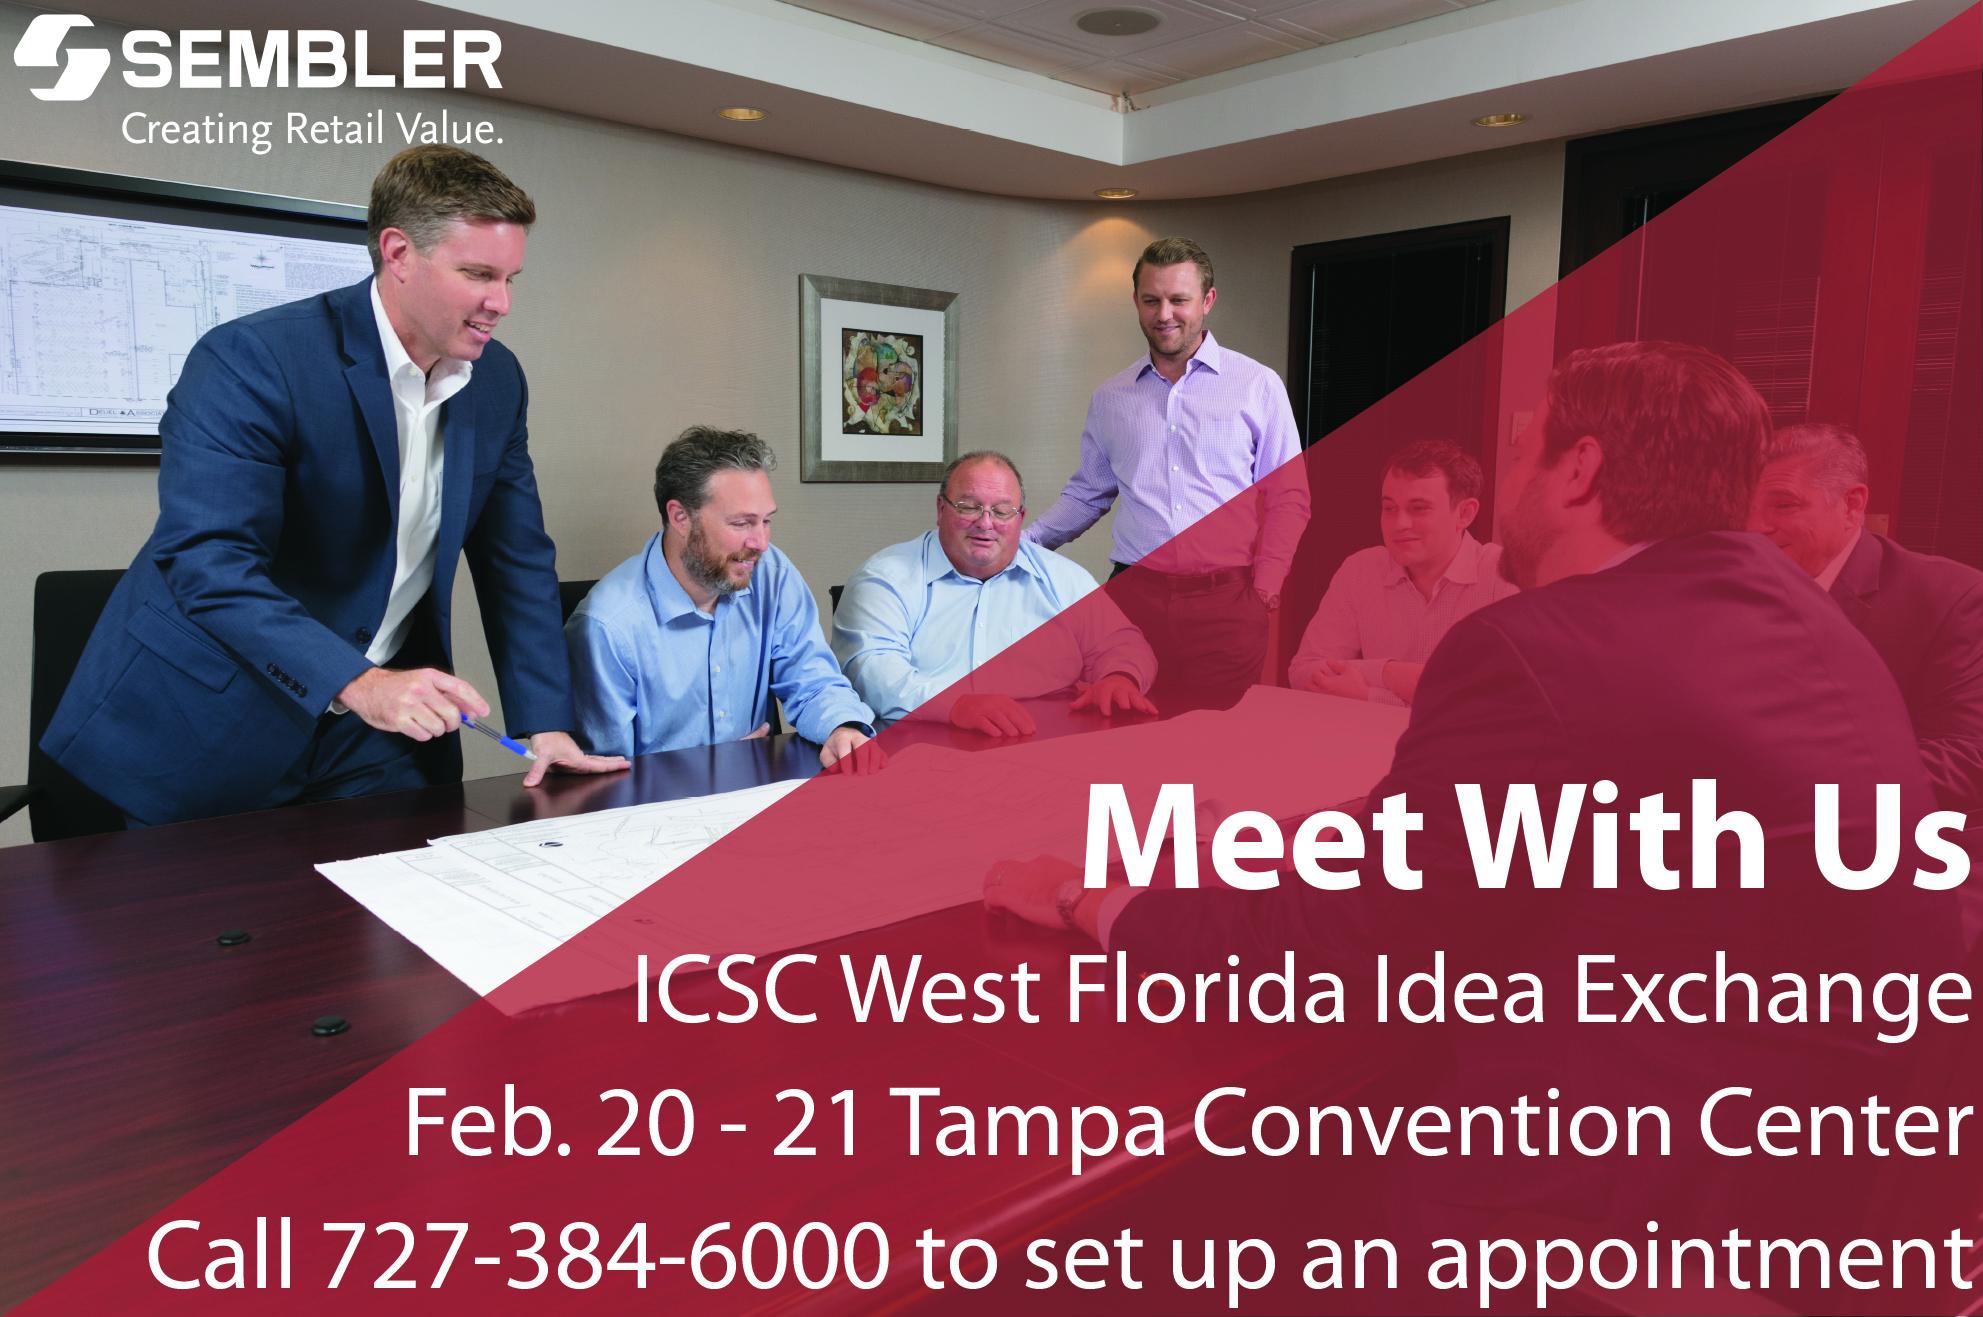 Meet With Our Team: ICSC West Florida Idea Exchange